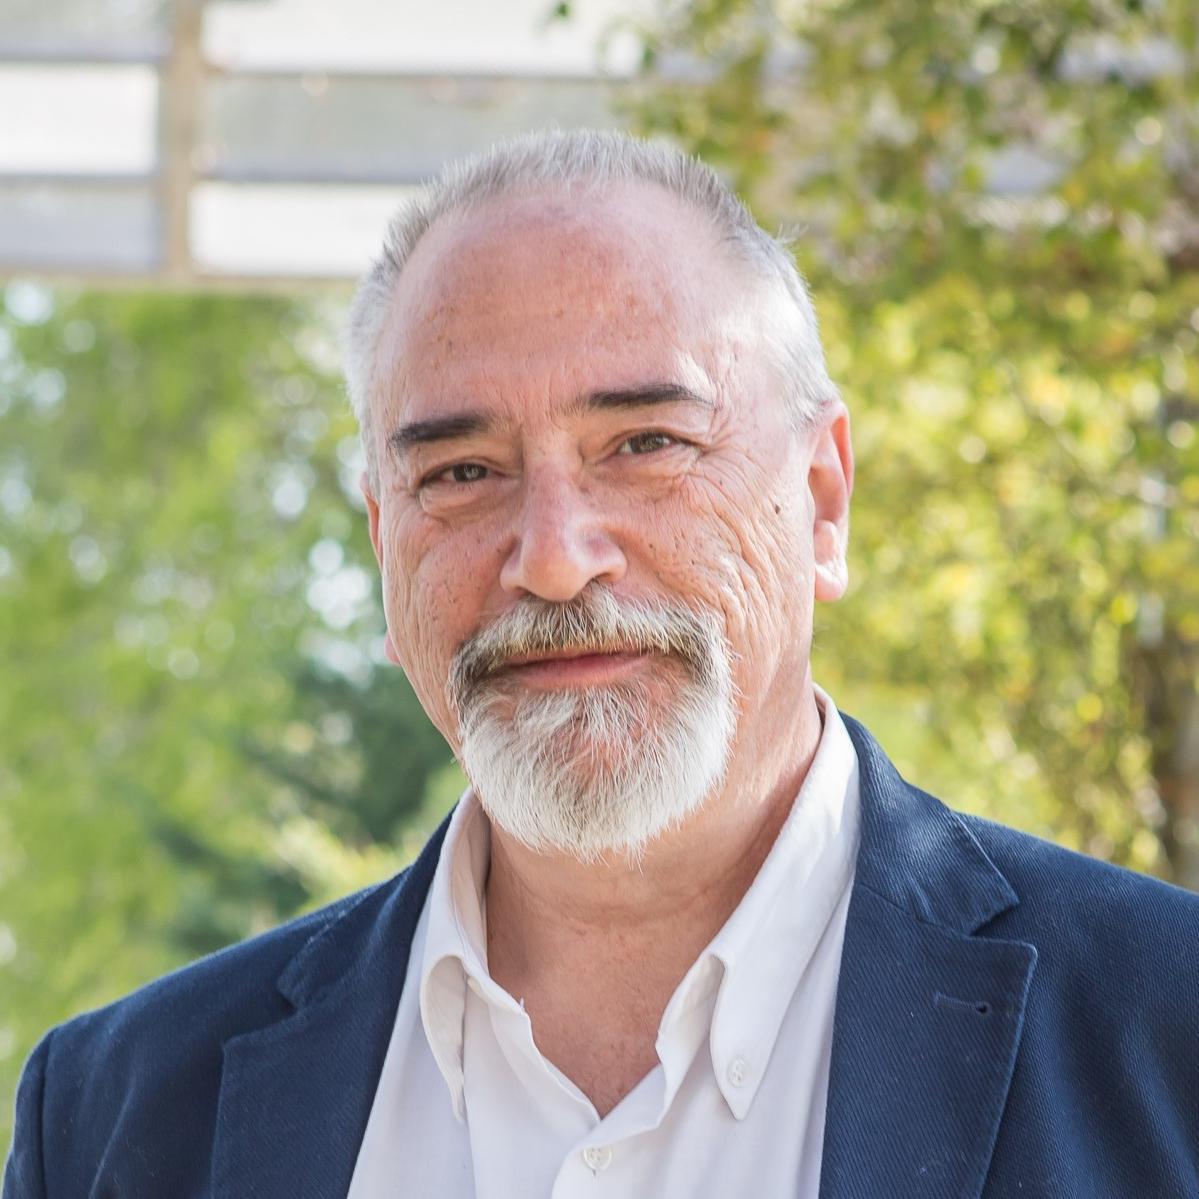 Antonio Flórez - Su perfil. Votar, valora y comunicate